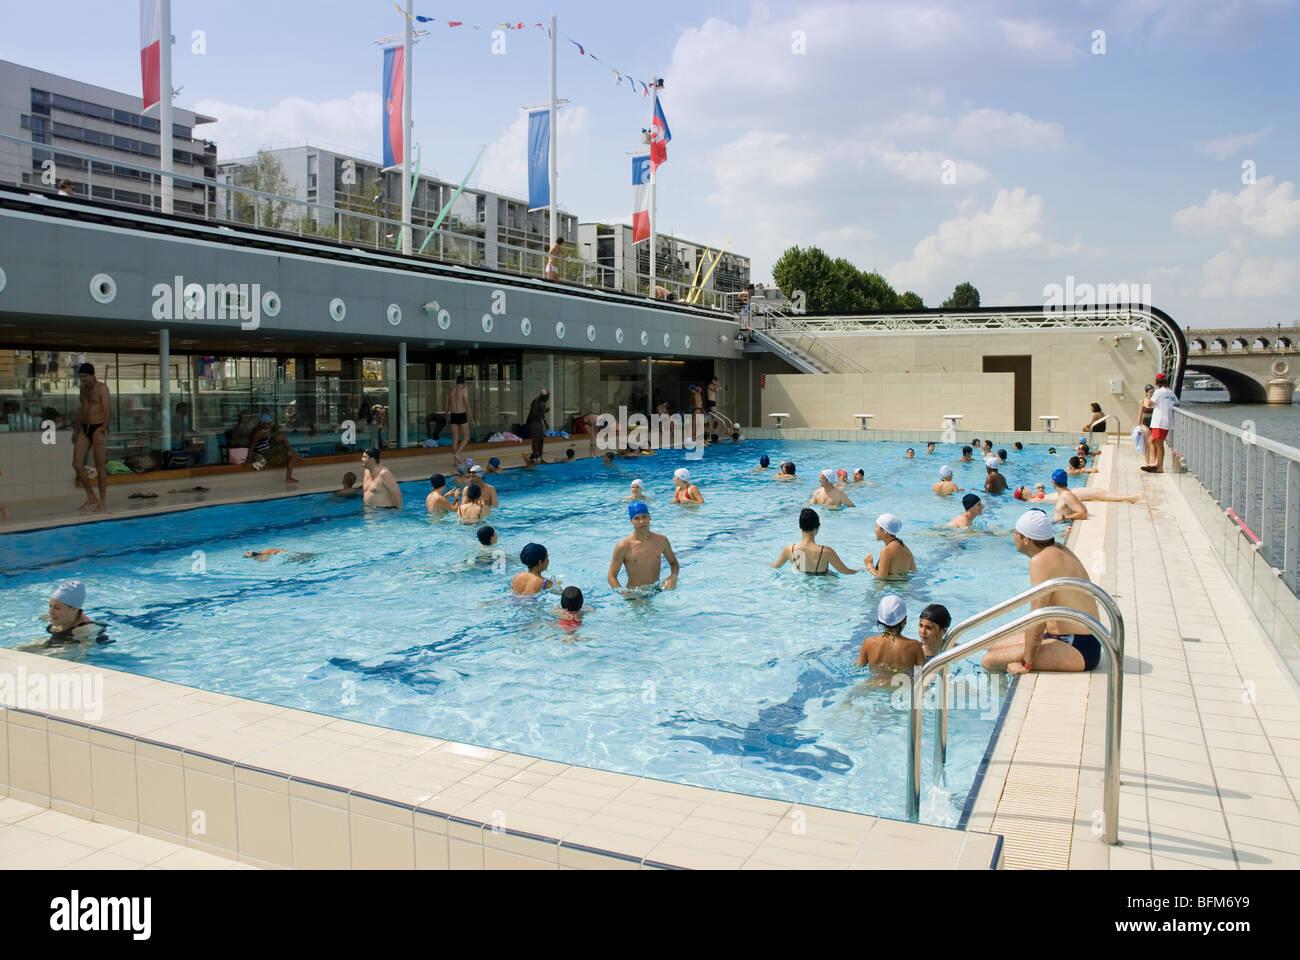 Piscine Josephine Baker floating swimming pool in the Seine Paris Stock Photo Royalty Free